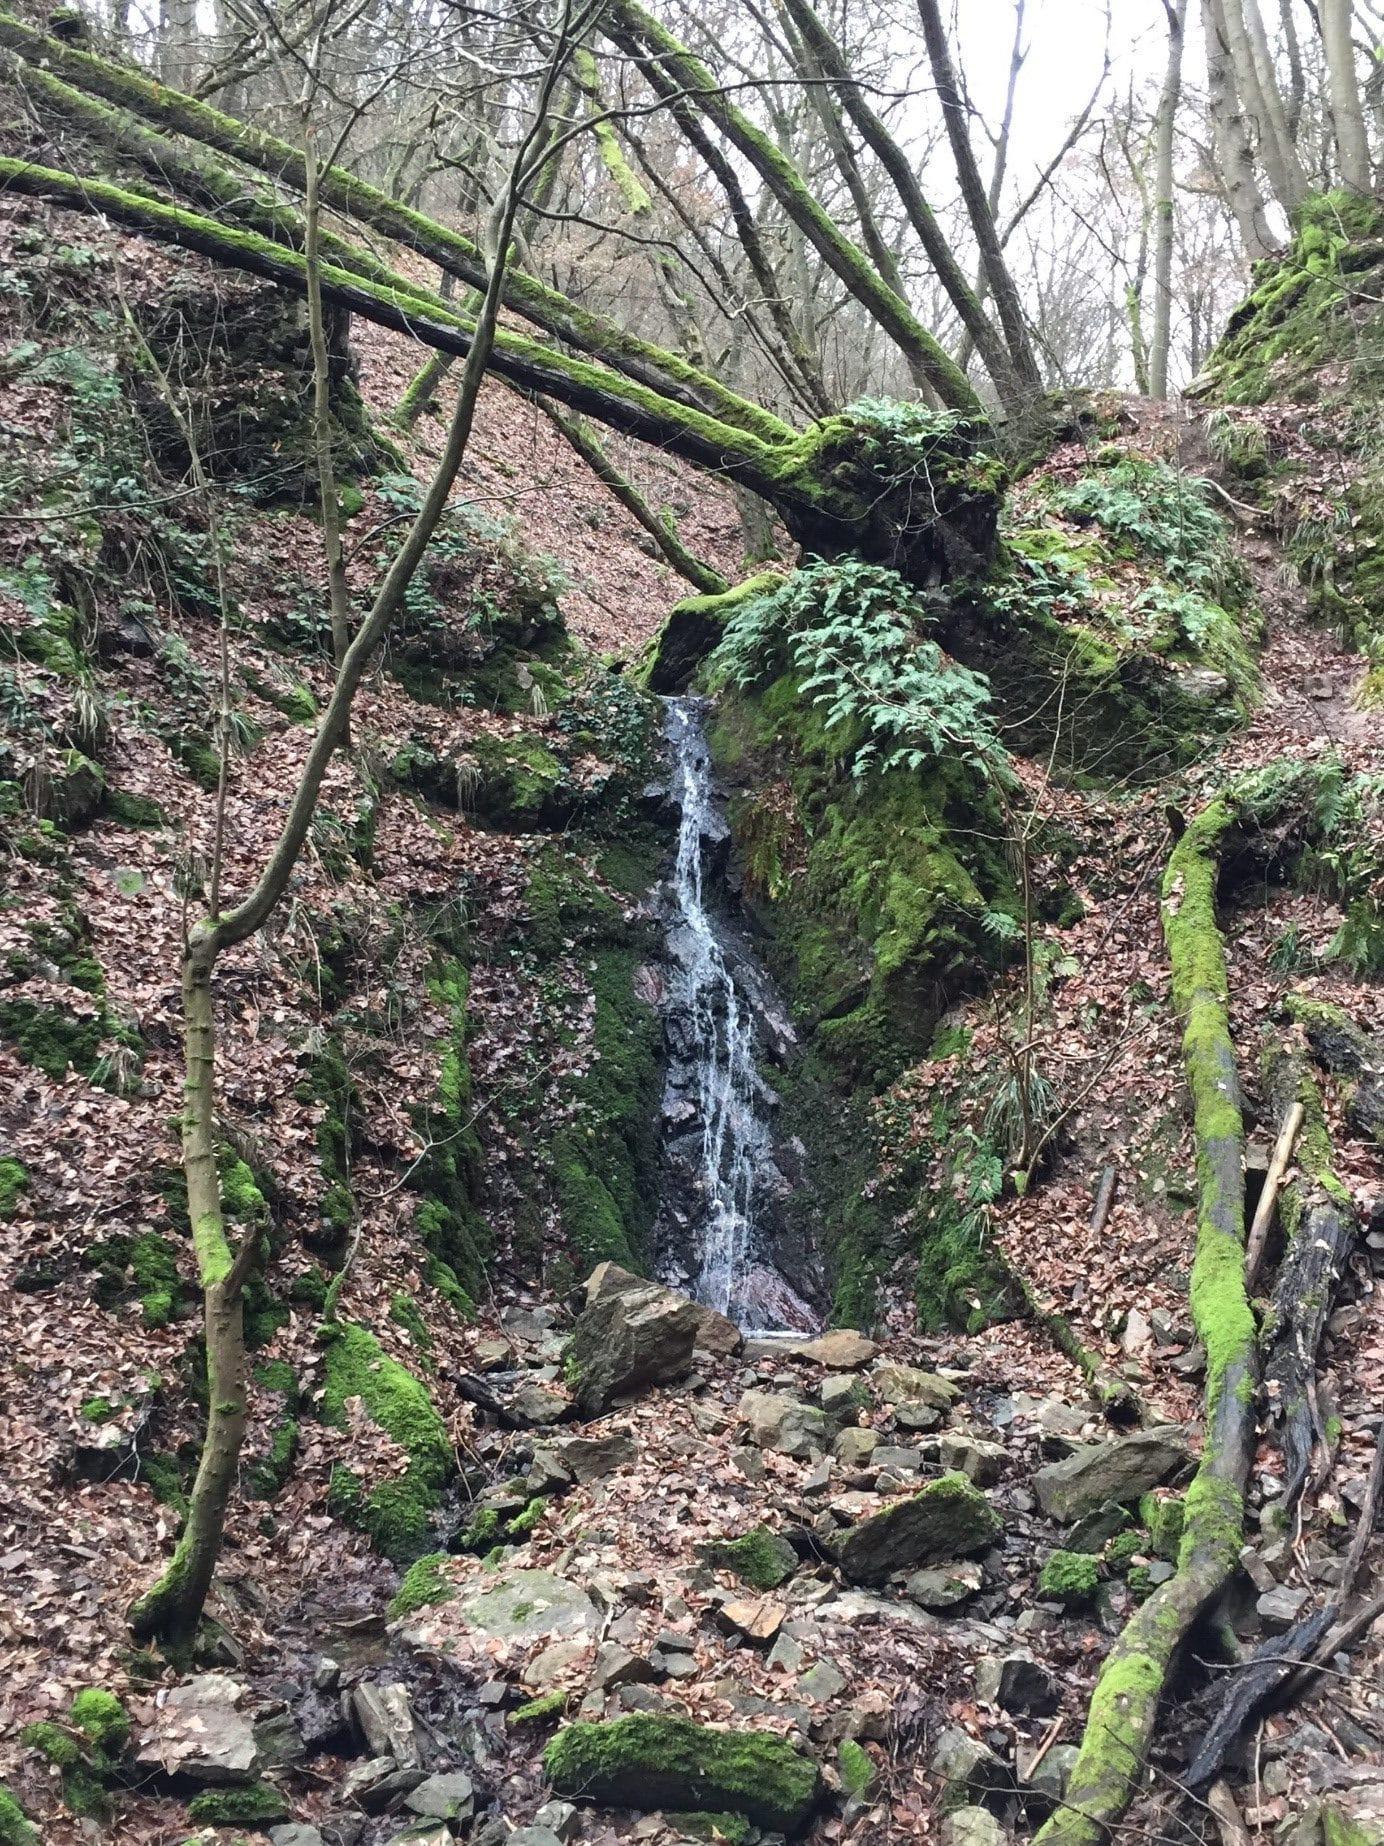 Impression zu Tagescoaching Bach im Wald